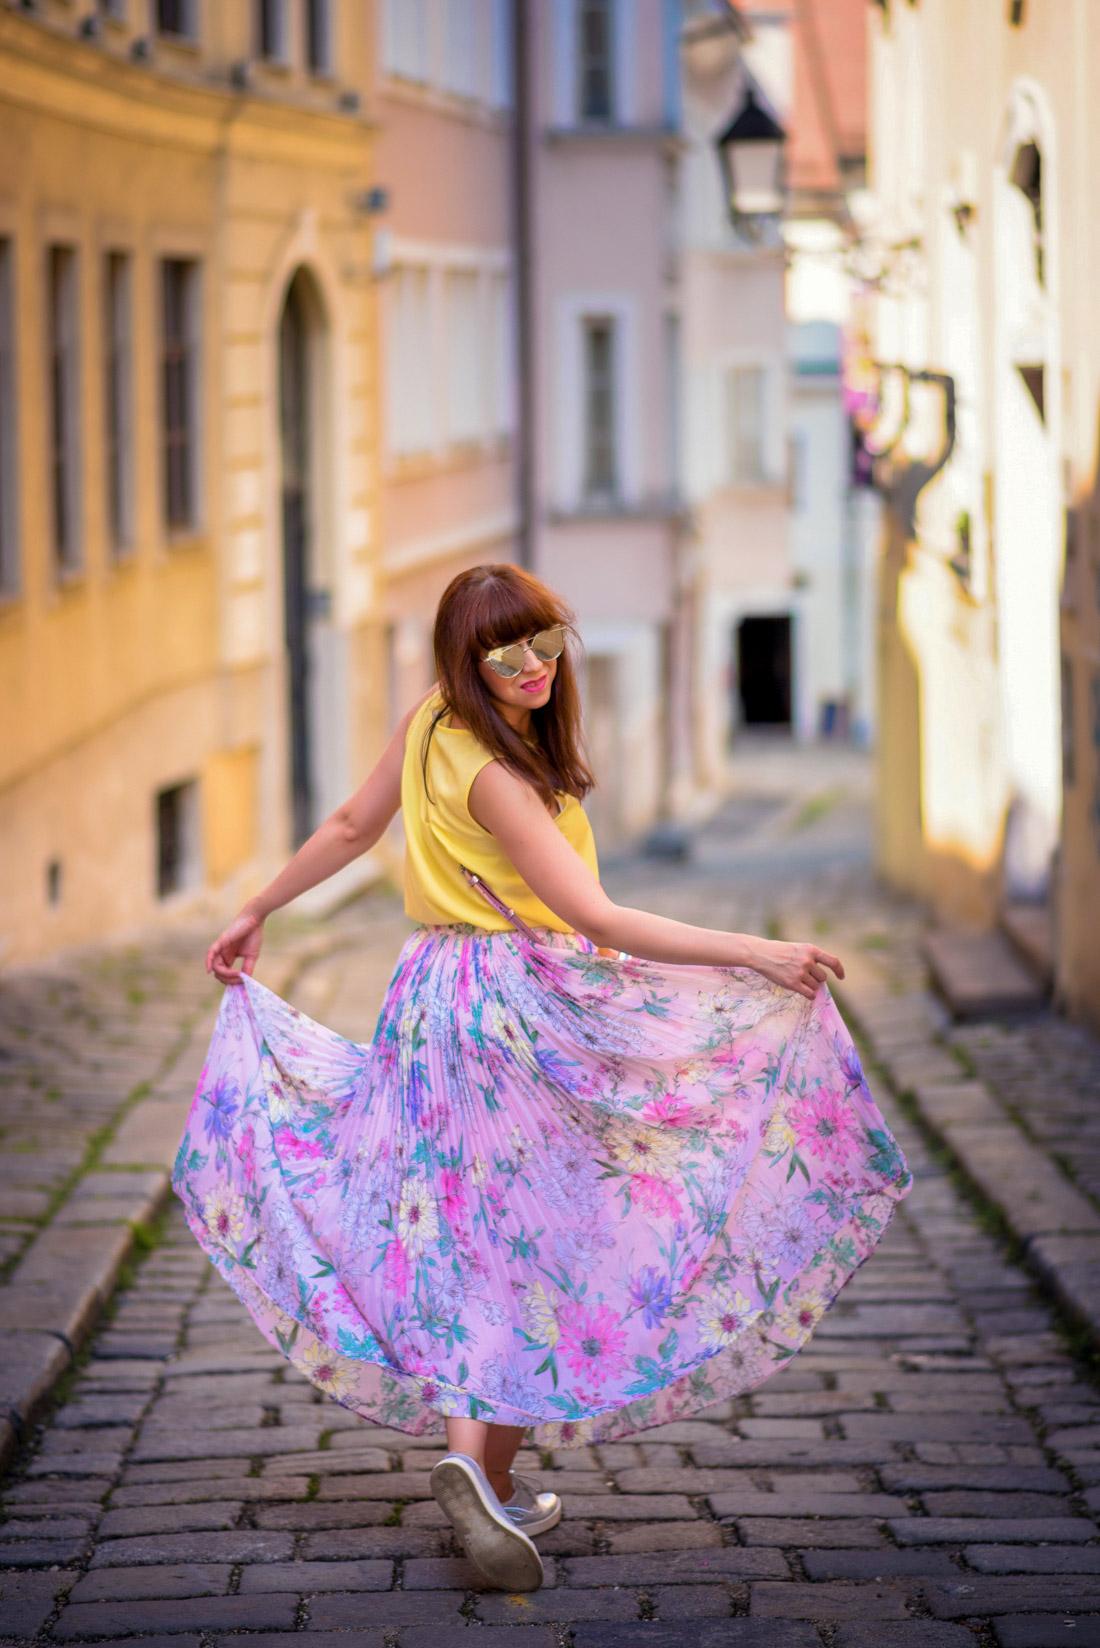 SUKŇA, KTORÁ VÁM VYRAZÍ DYCH_Katharine-fashion is beautiful_blog 16_Kvetinová plisovaná sukňa_Pastelové farby_Kabelka od Answear_Katarína Jakubčová_Fashion blogerka